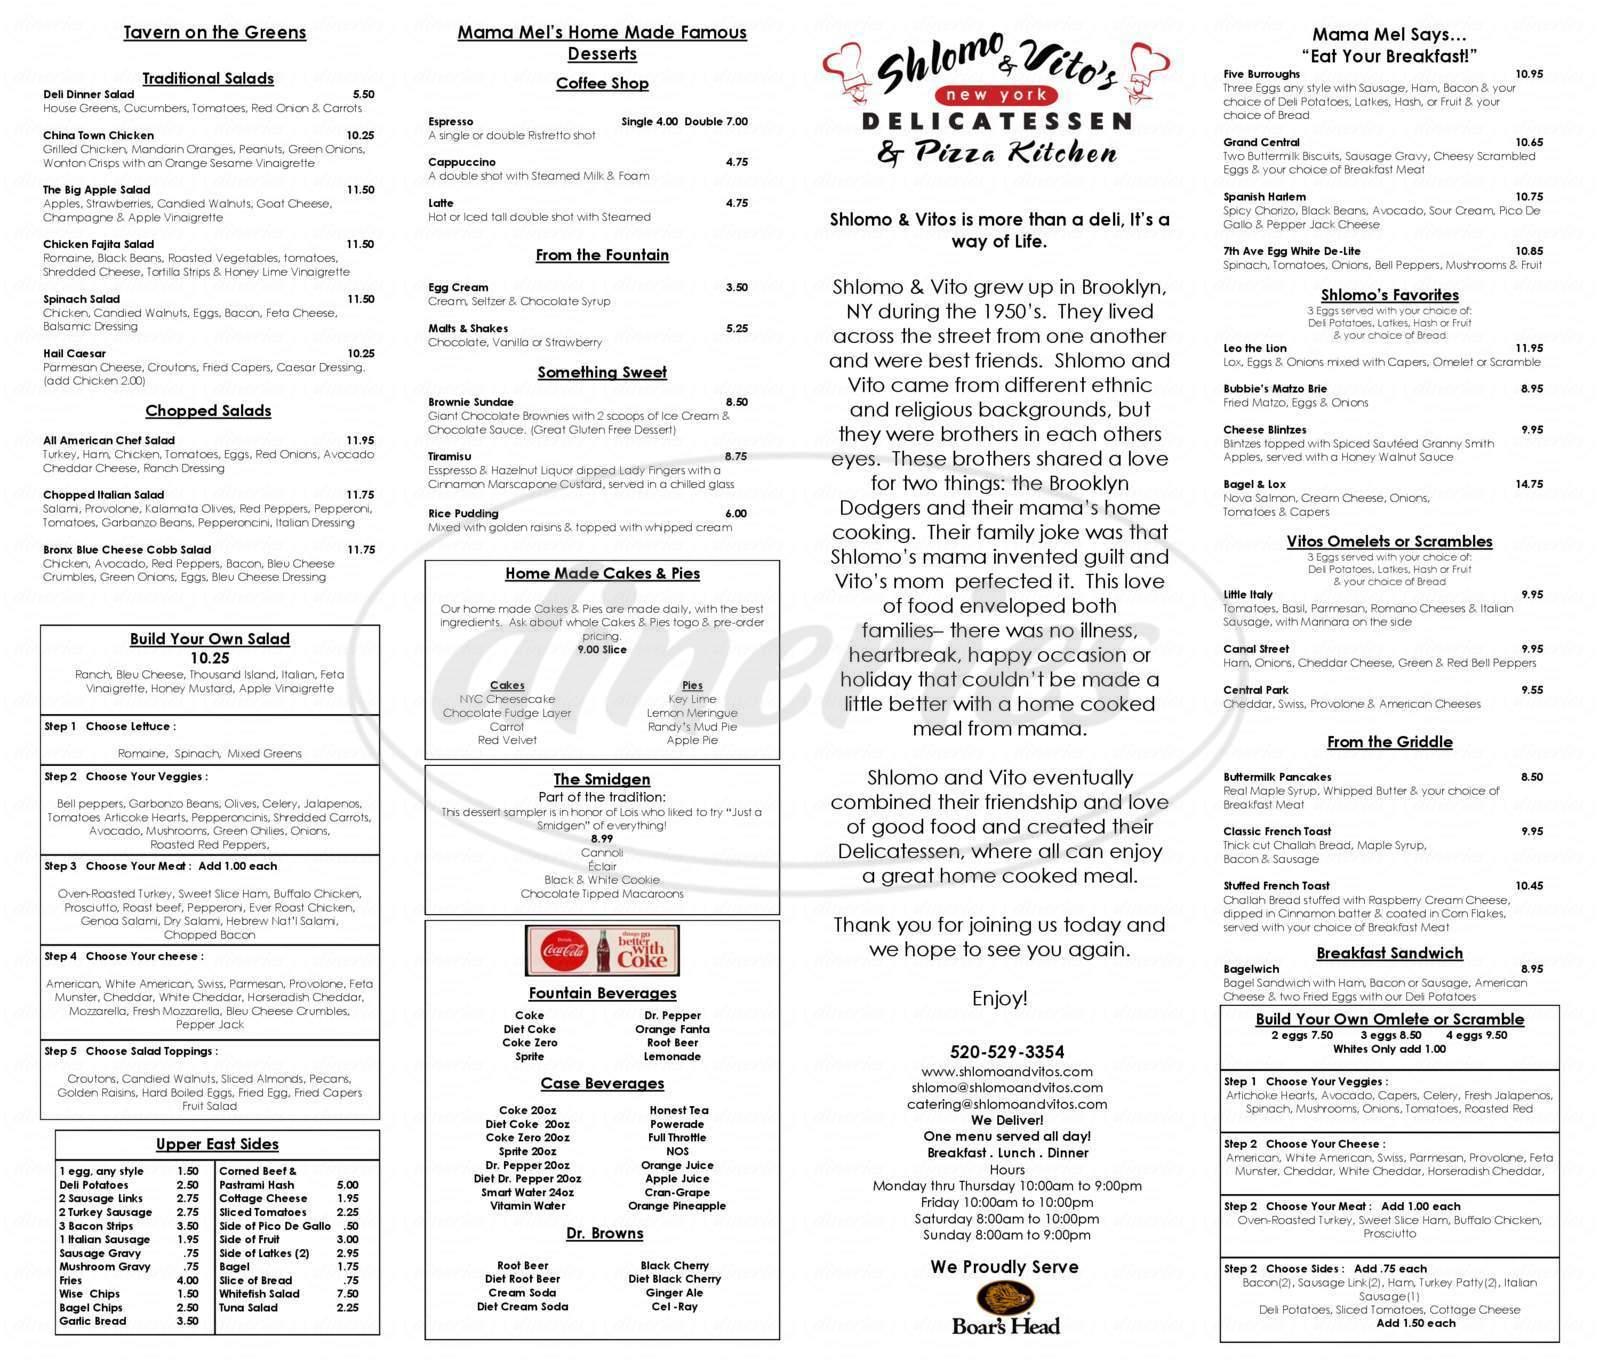 menu for Shlomo & Vito's New York Delicatessen & Pizza Kitchen